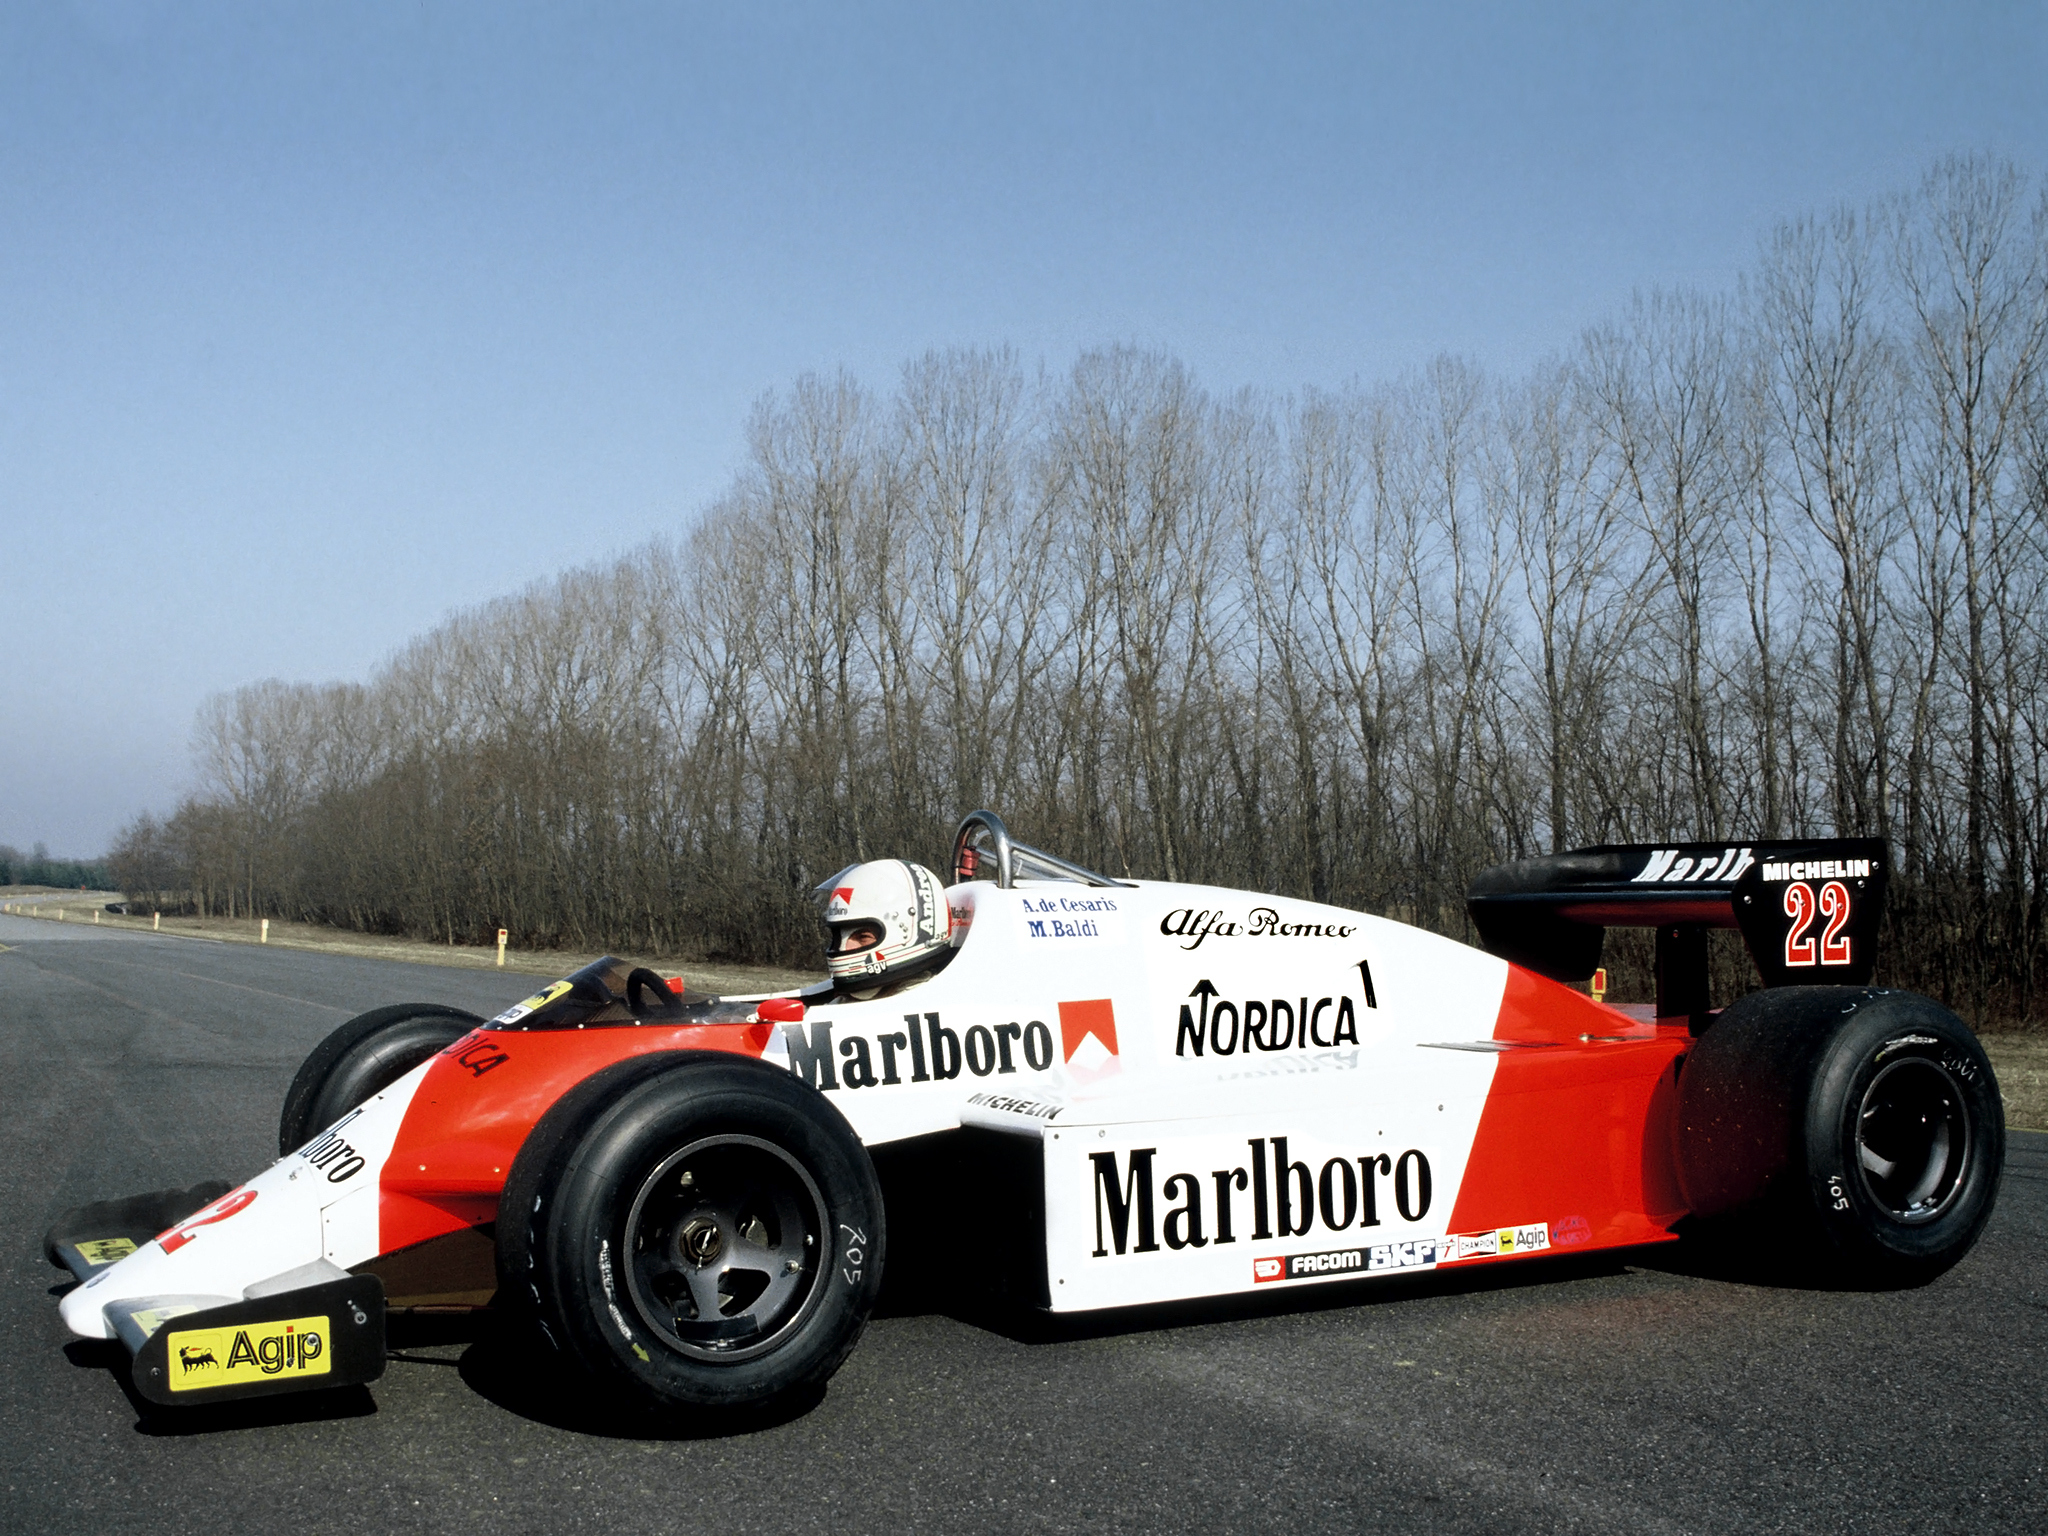 1983 Alfa Romeo 183t Formula One F 1 Race Racing Y Wallpaper 2048x1536 143779 Wallpaperup